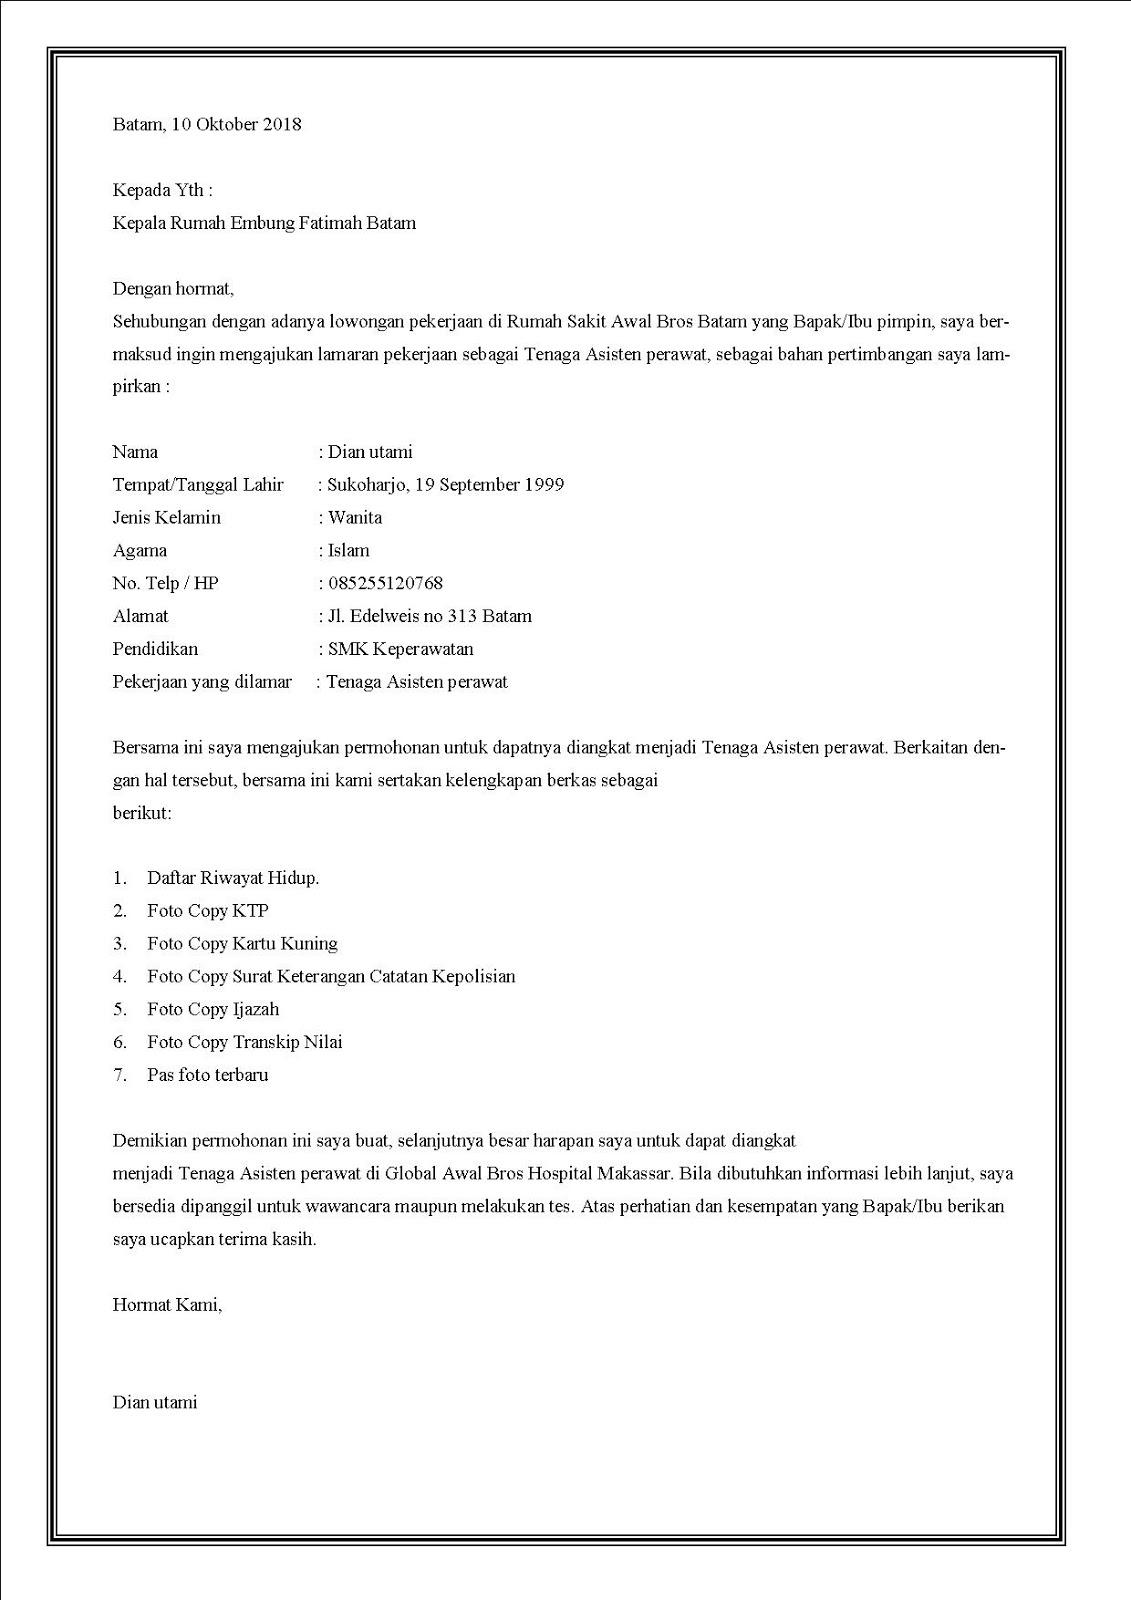 contoh surat lamaran kerja di rumah sakit sebagai asisten perawat